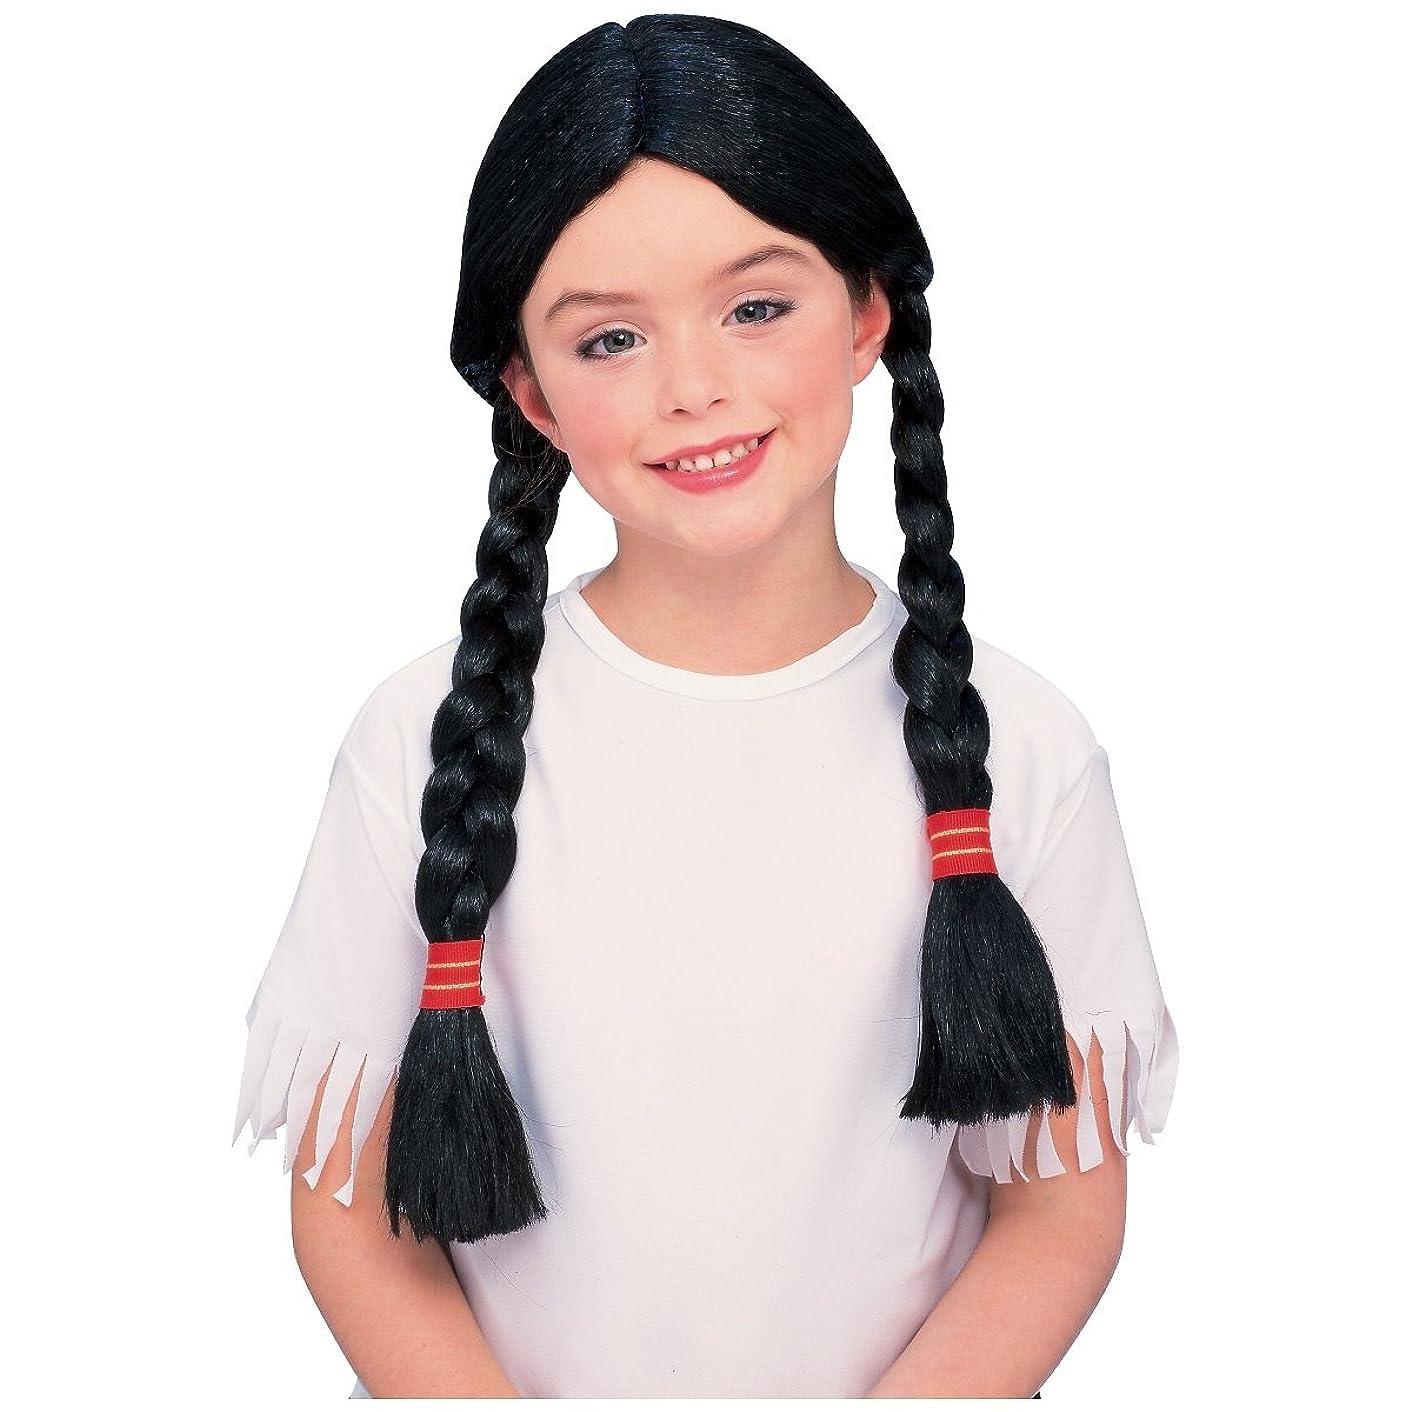 Native American Girl Wig Costume Accessory